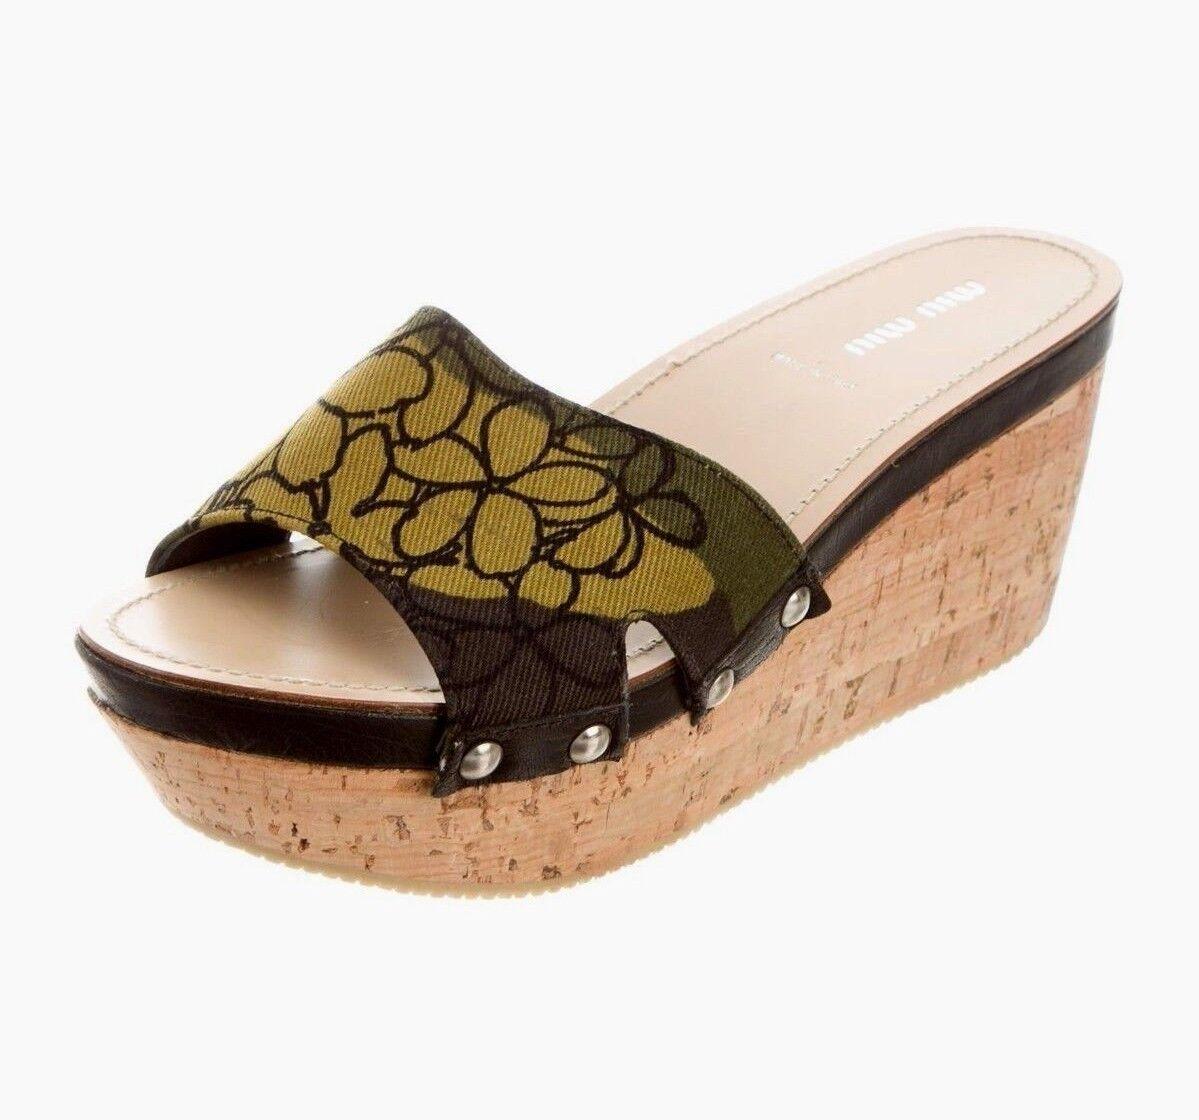 MIU MIU Canvas Multi Olive Green Miu Printed Platform Wedges Slides Sandals 38 8